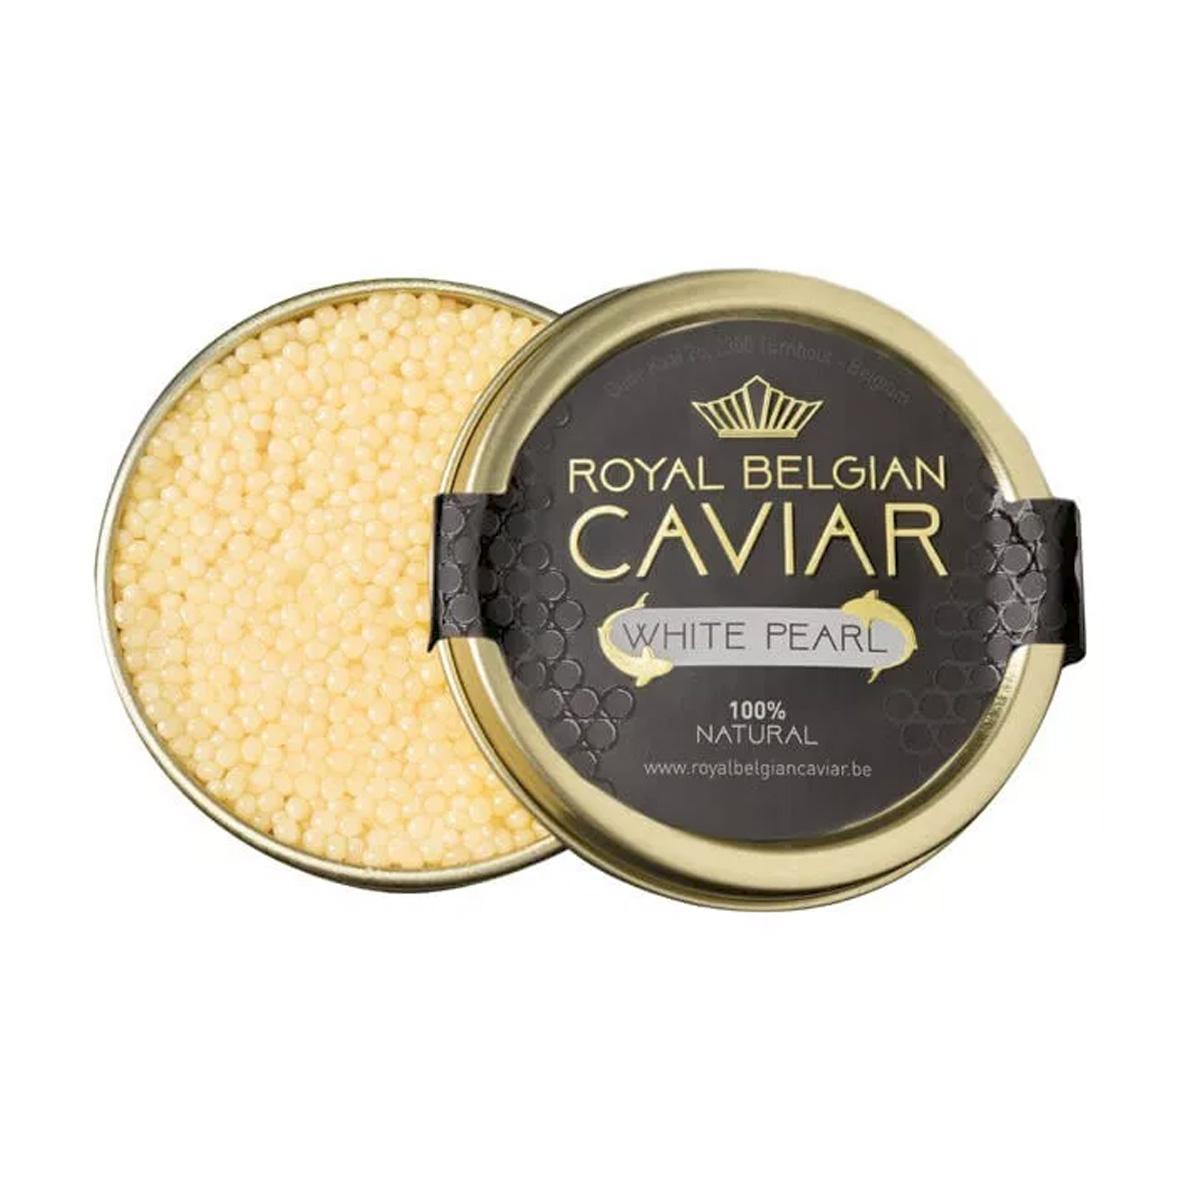 Caviar - Royal Belgian Caviar - White Pearl